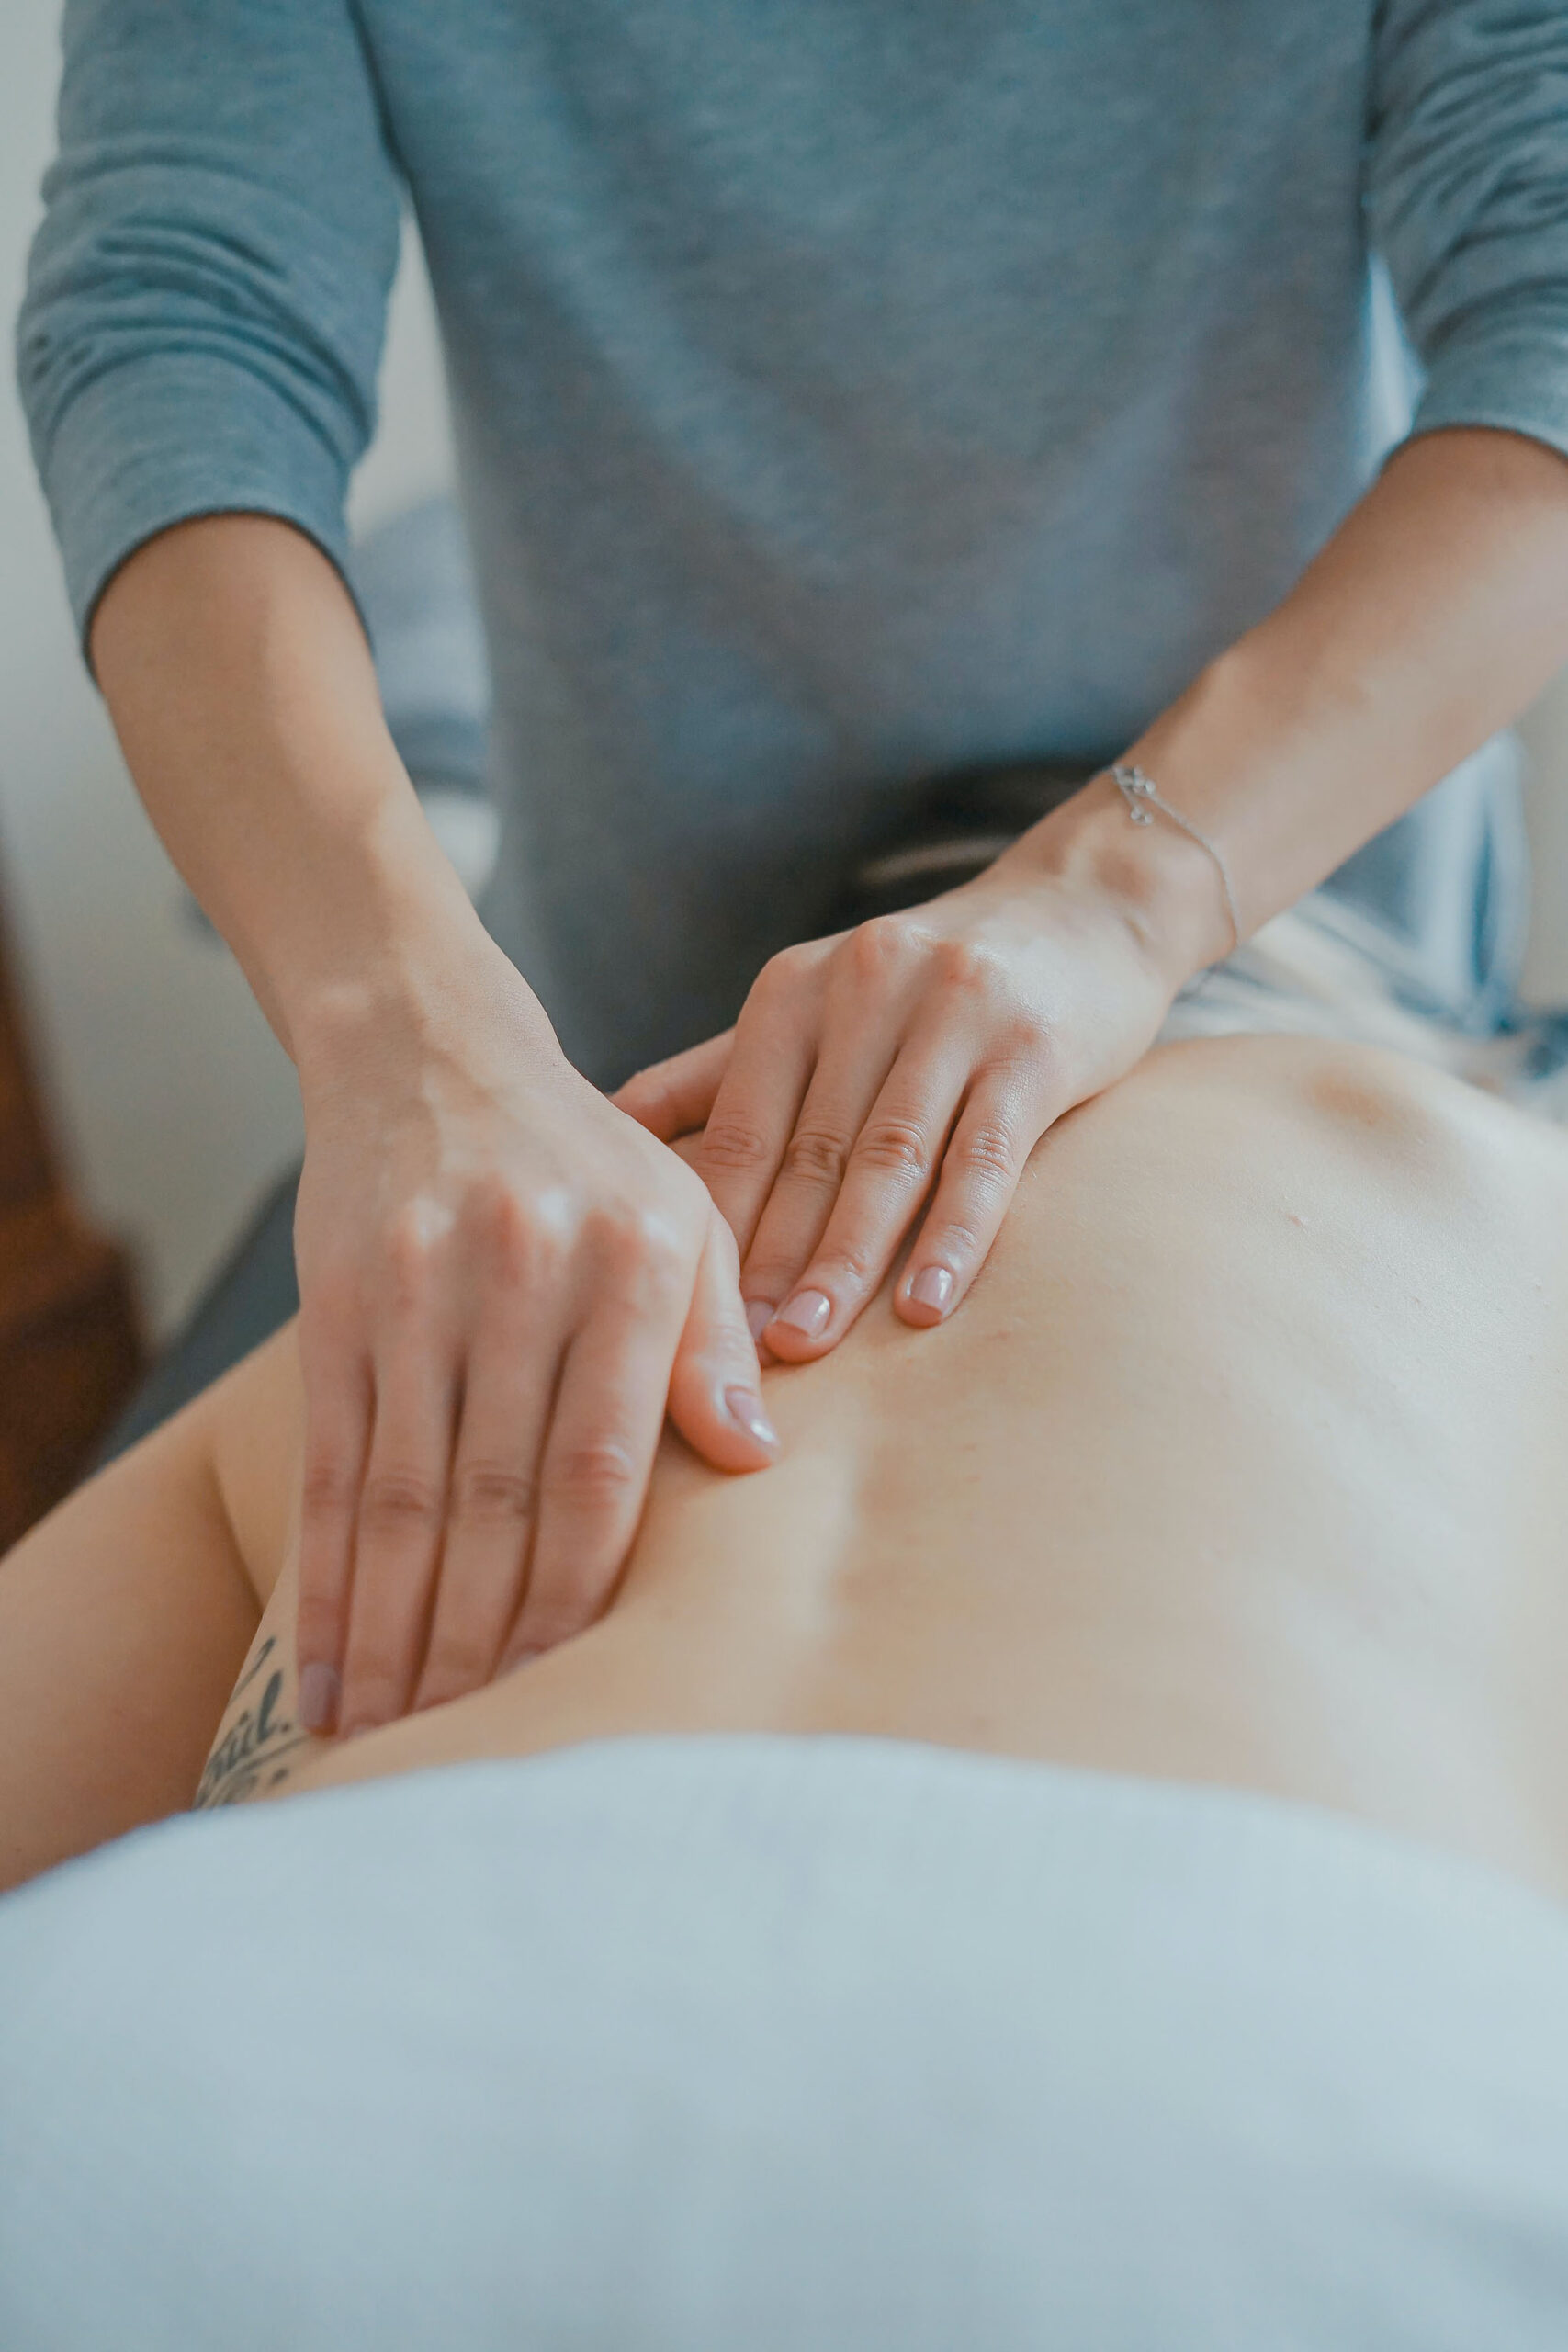 Massage Hennings physio Lauenau